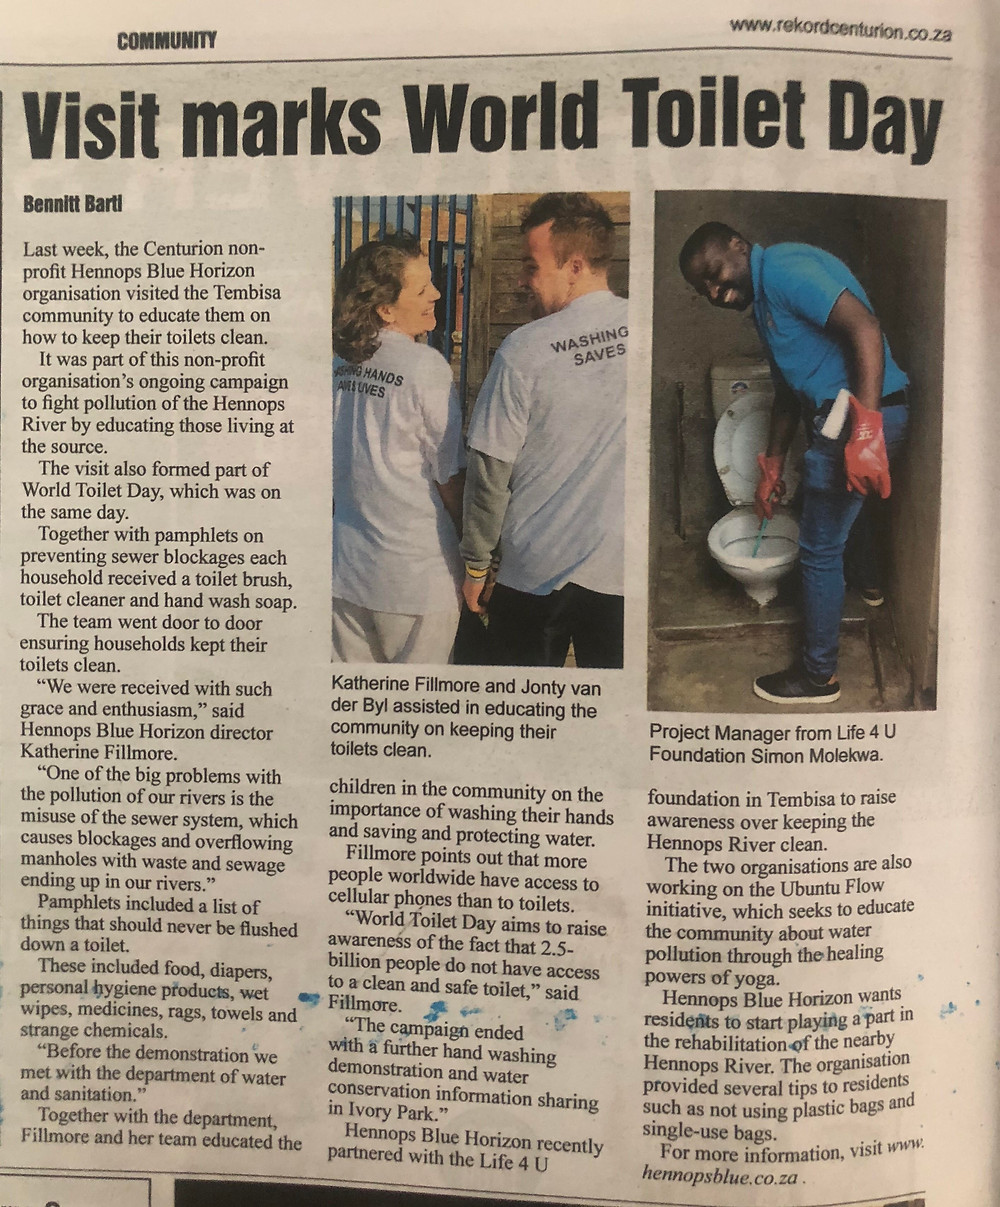 Visit marks World Toilet Day - Rekord